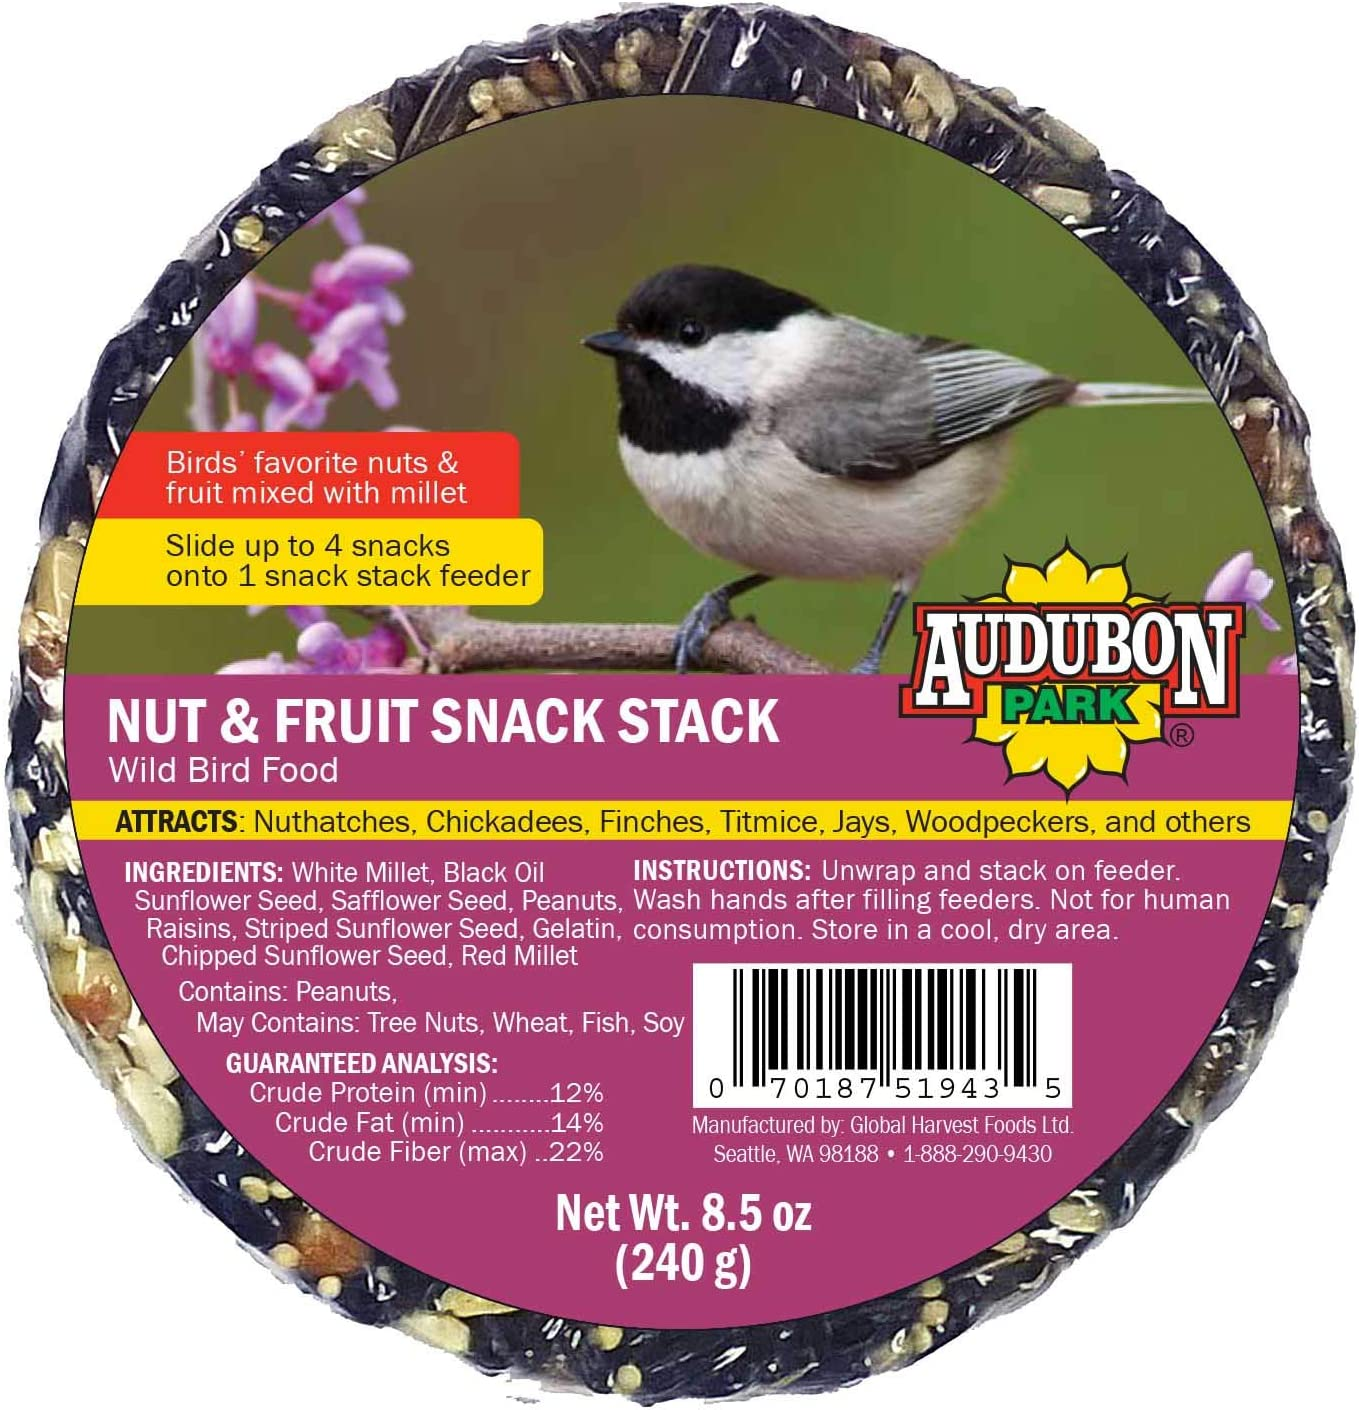 Audubon Park 13142 Nut and Fruit Snack Stack Wild Bird Food, 6-Pack